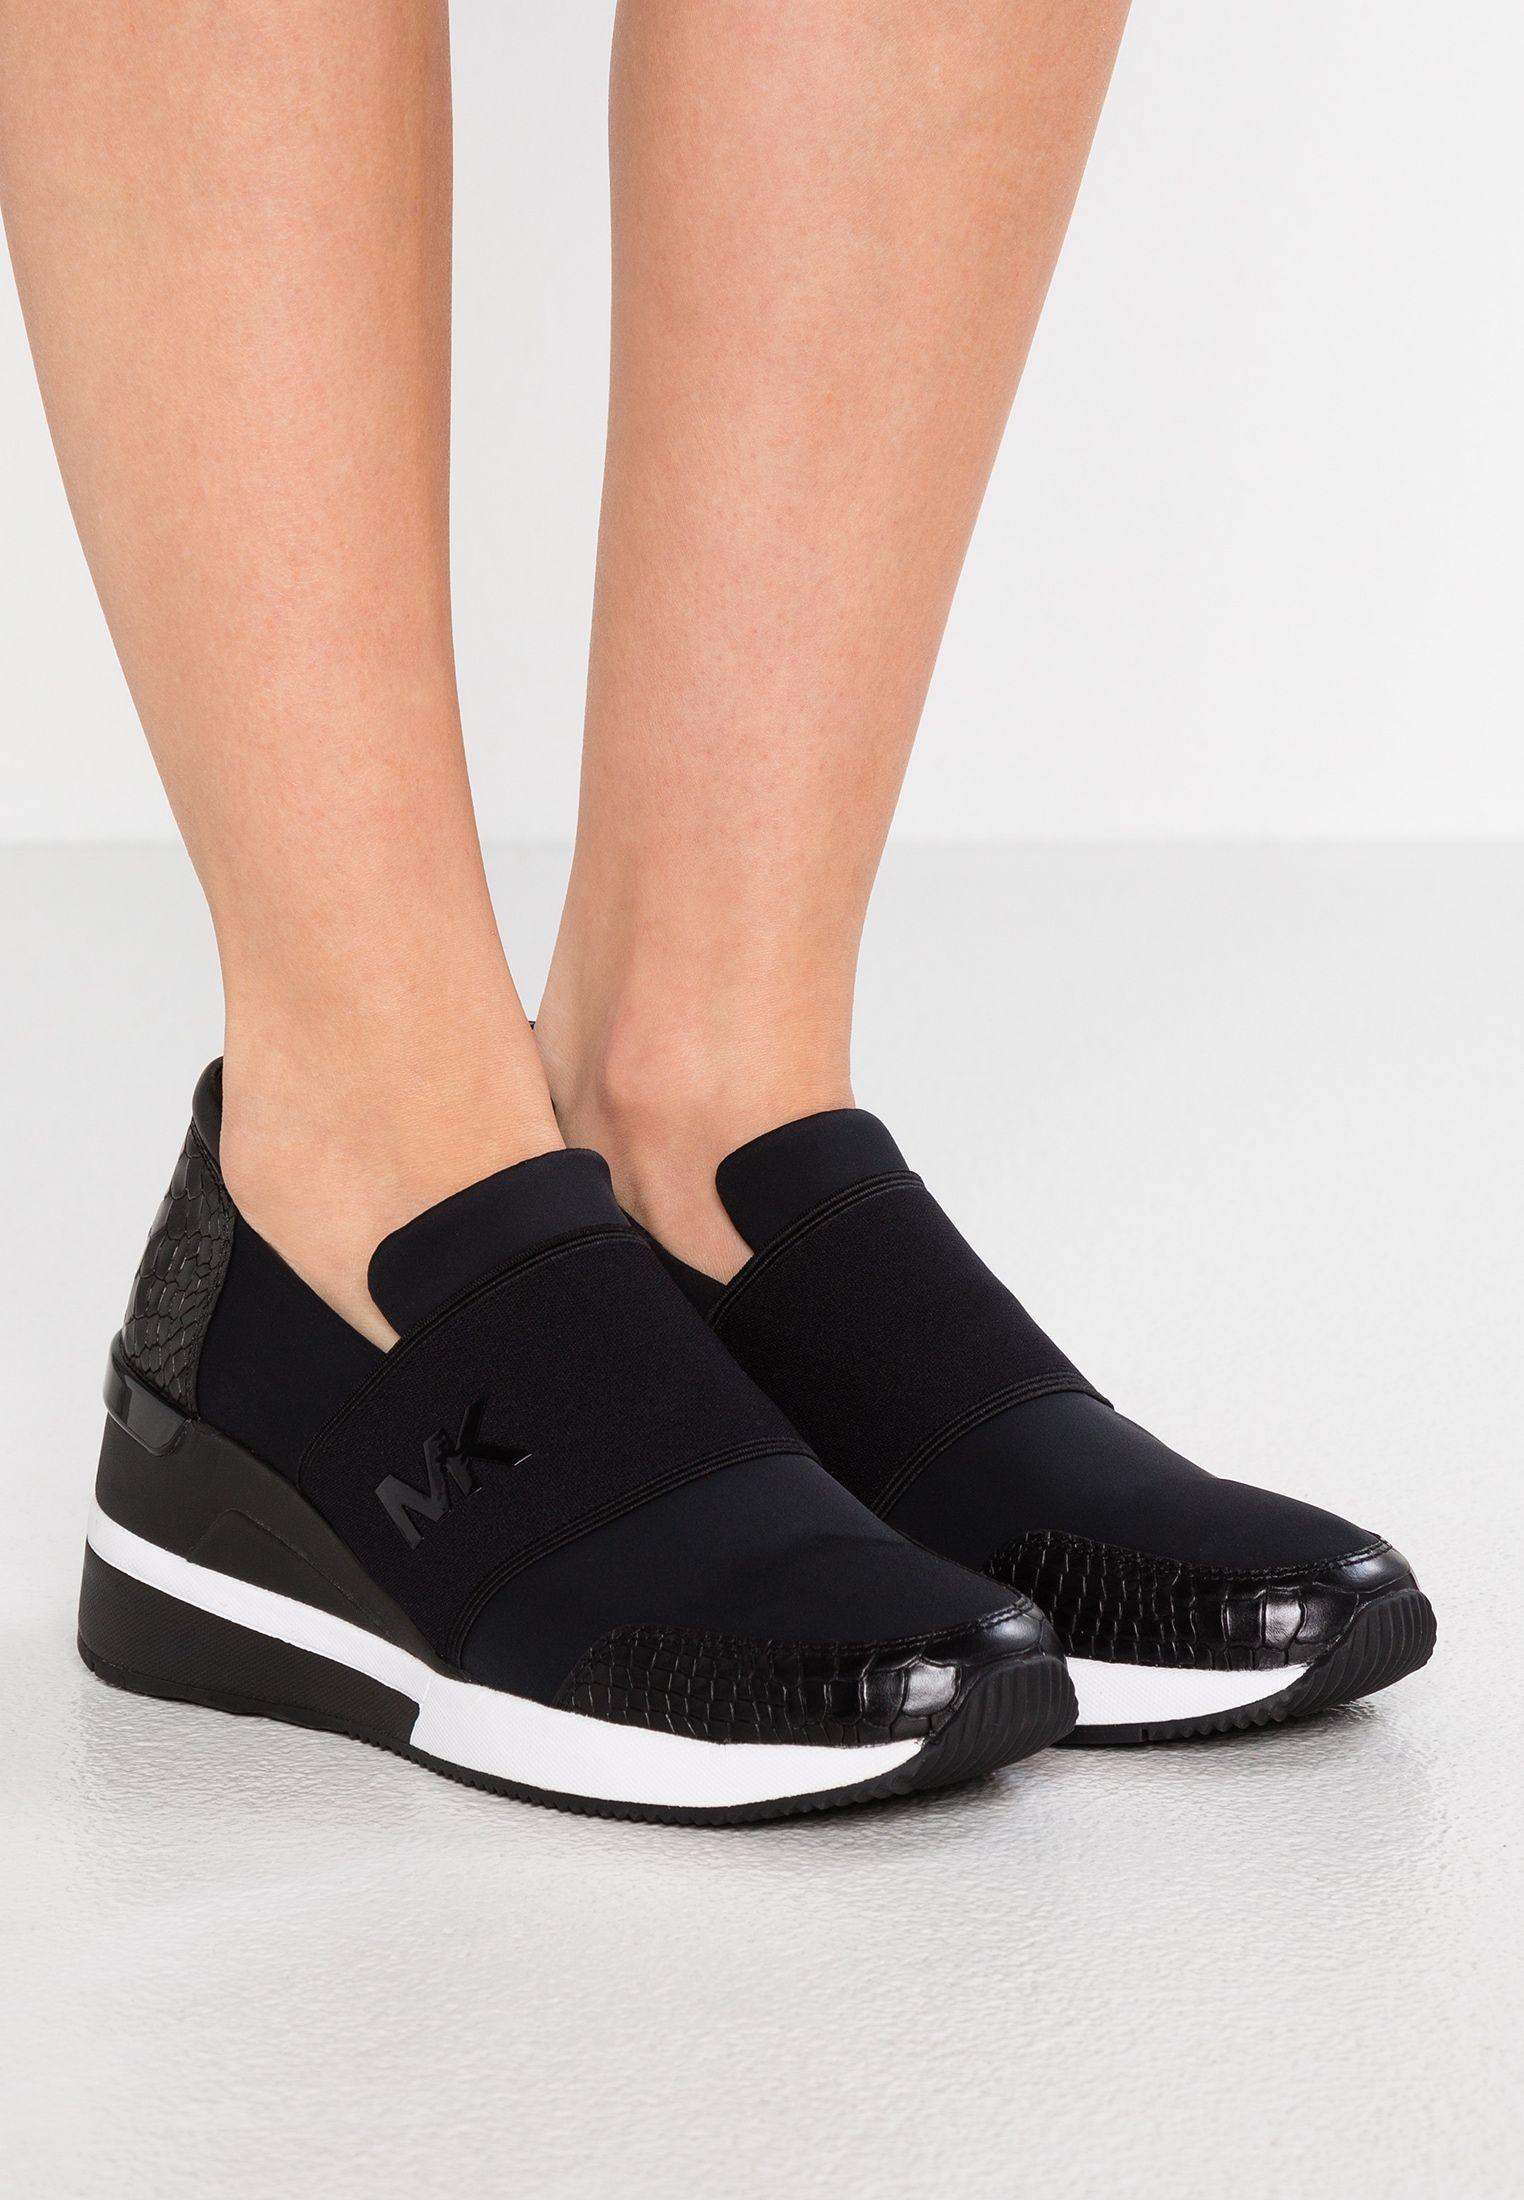 bd62dbcb4 FELIX TRAINER - Slip-ons - black @ Zalando.co.uk 🛒 in 2019 | Обувь ...